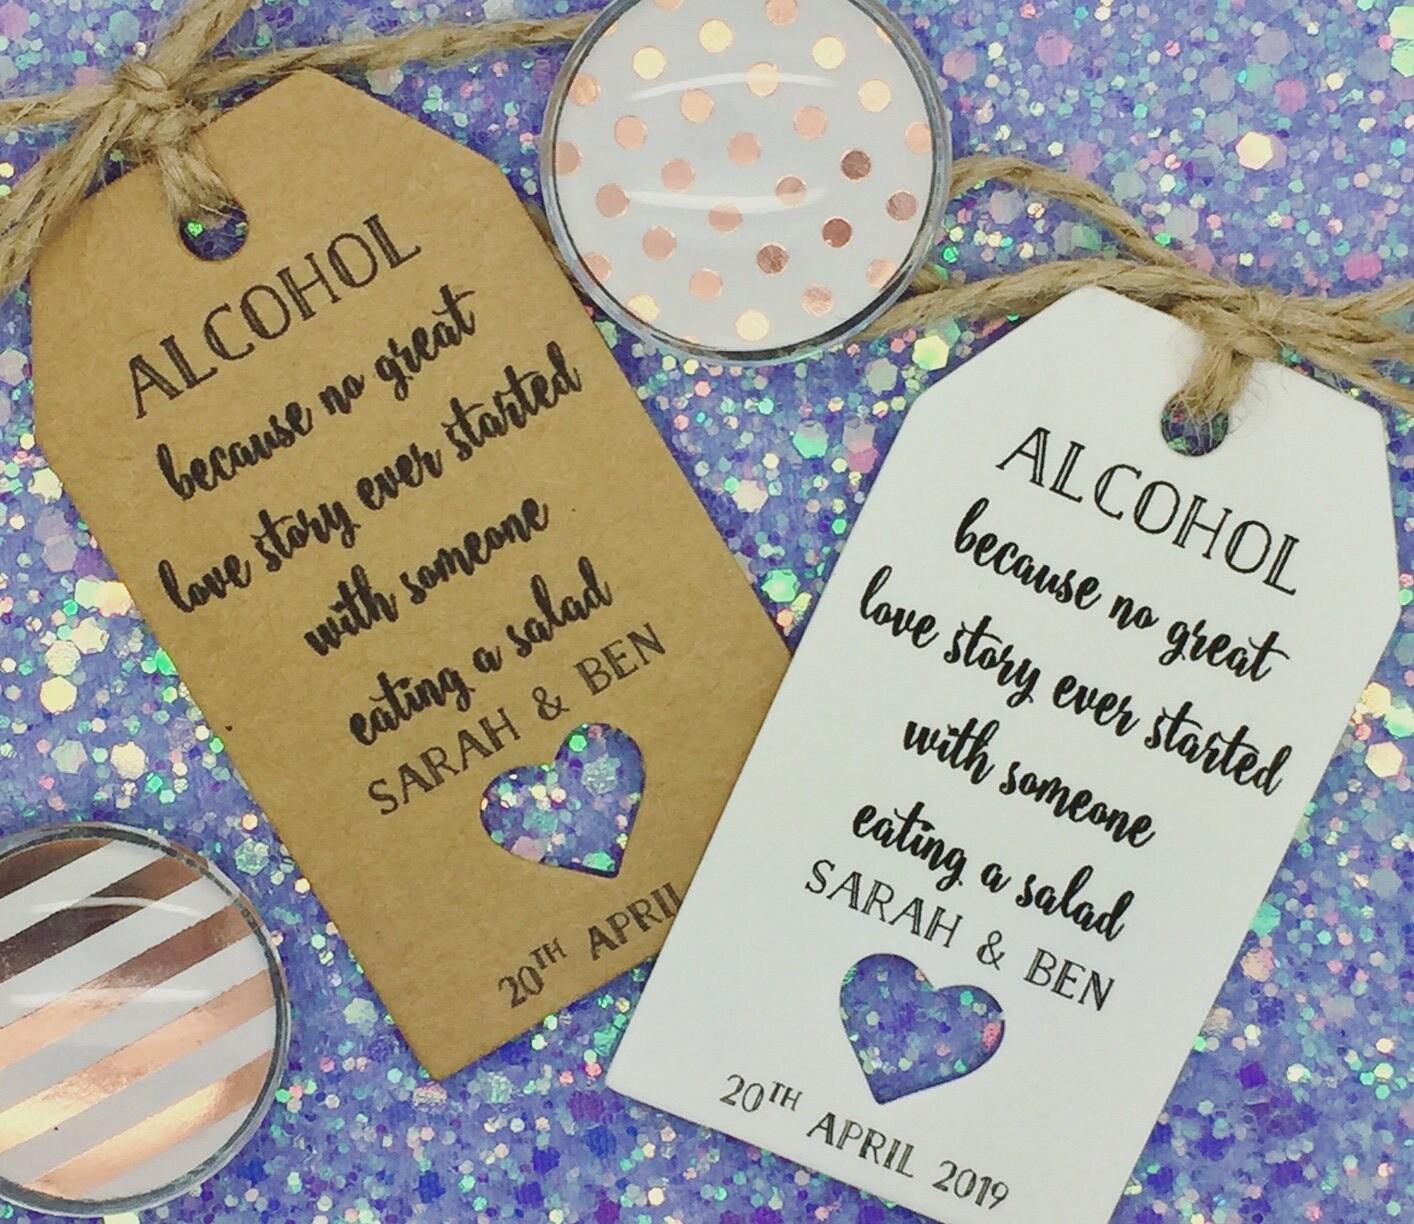 Alcohol Favour Wedding Gift Tags Drink Me Bottle Alice in Wonderland